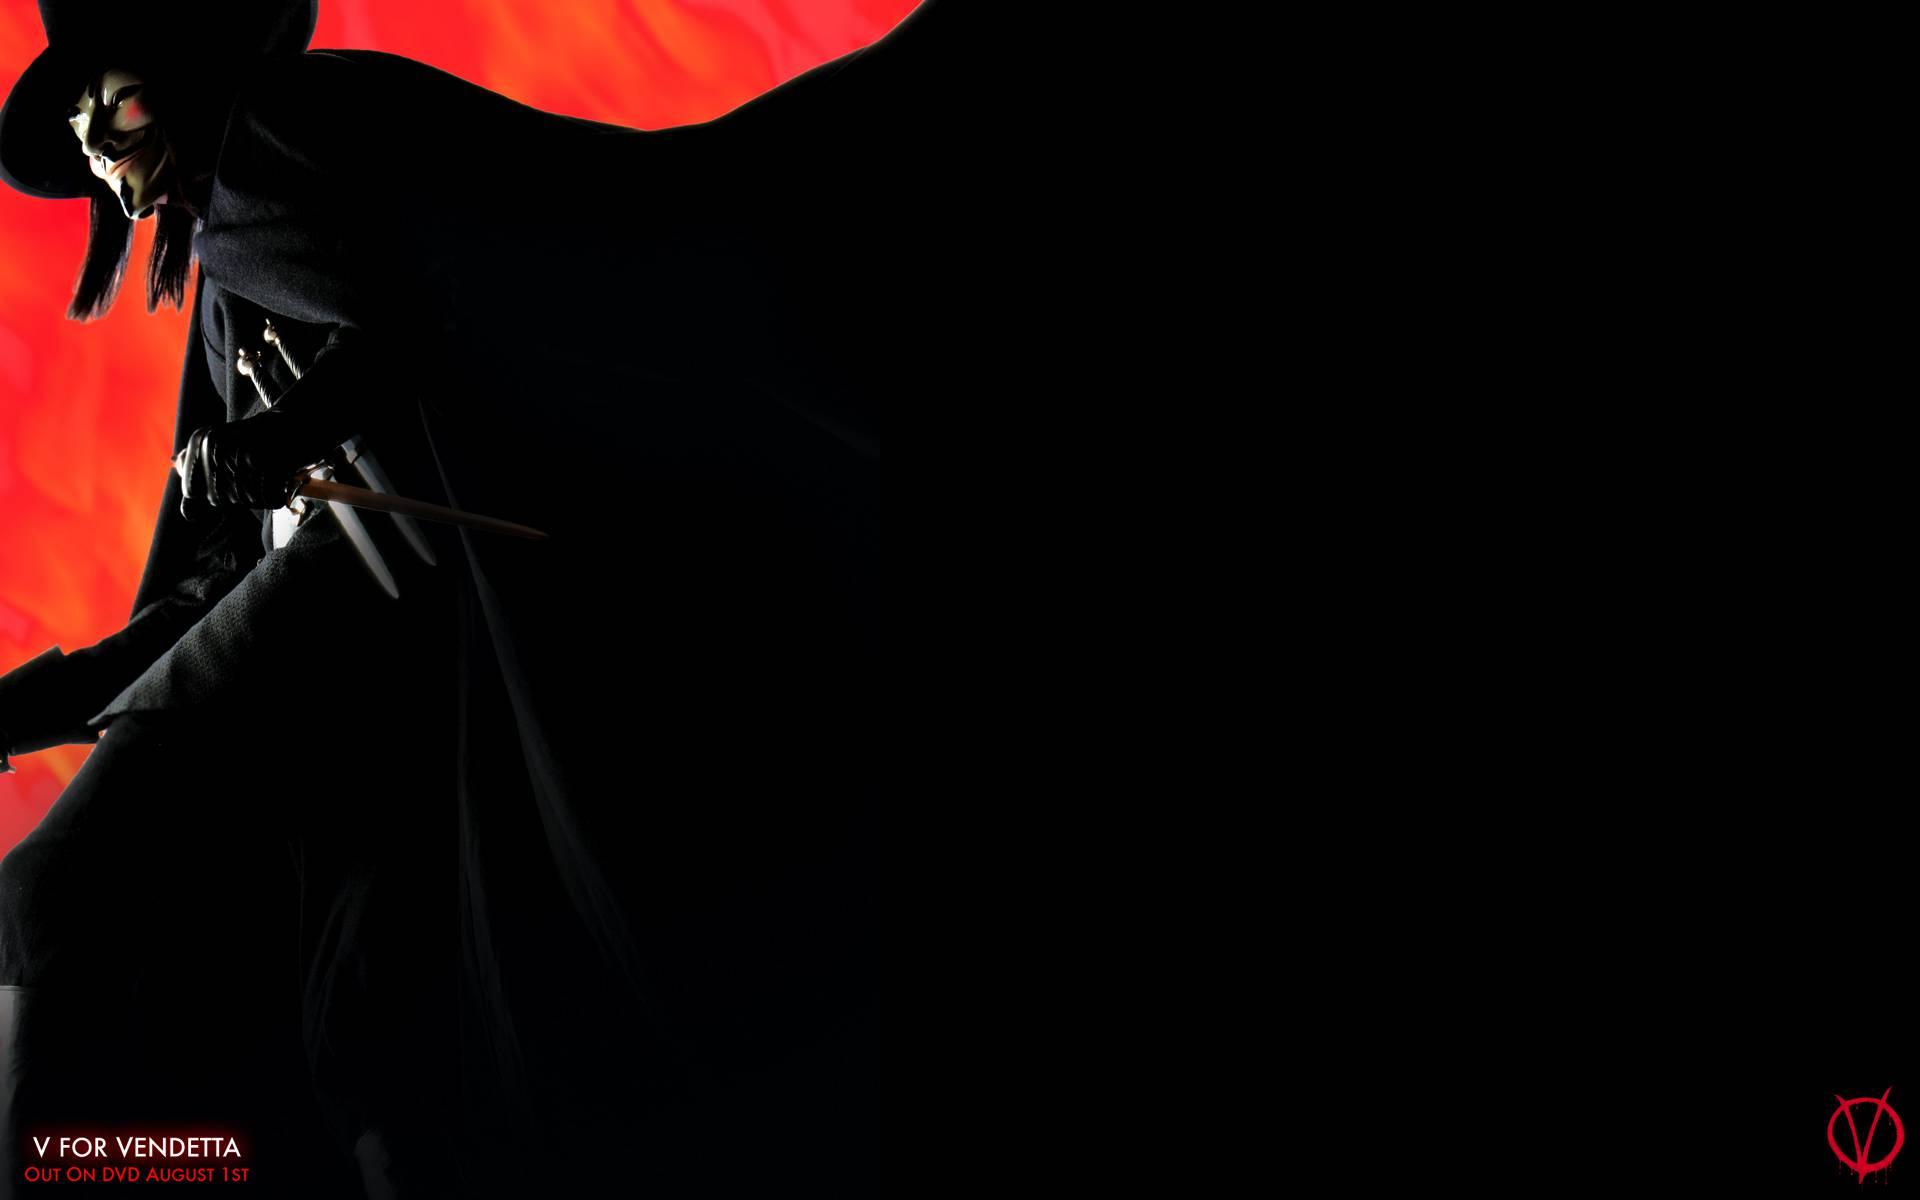 Vendetta Mask Wallpapers Impremedianet